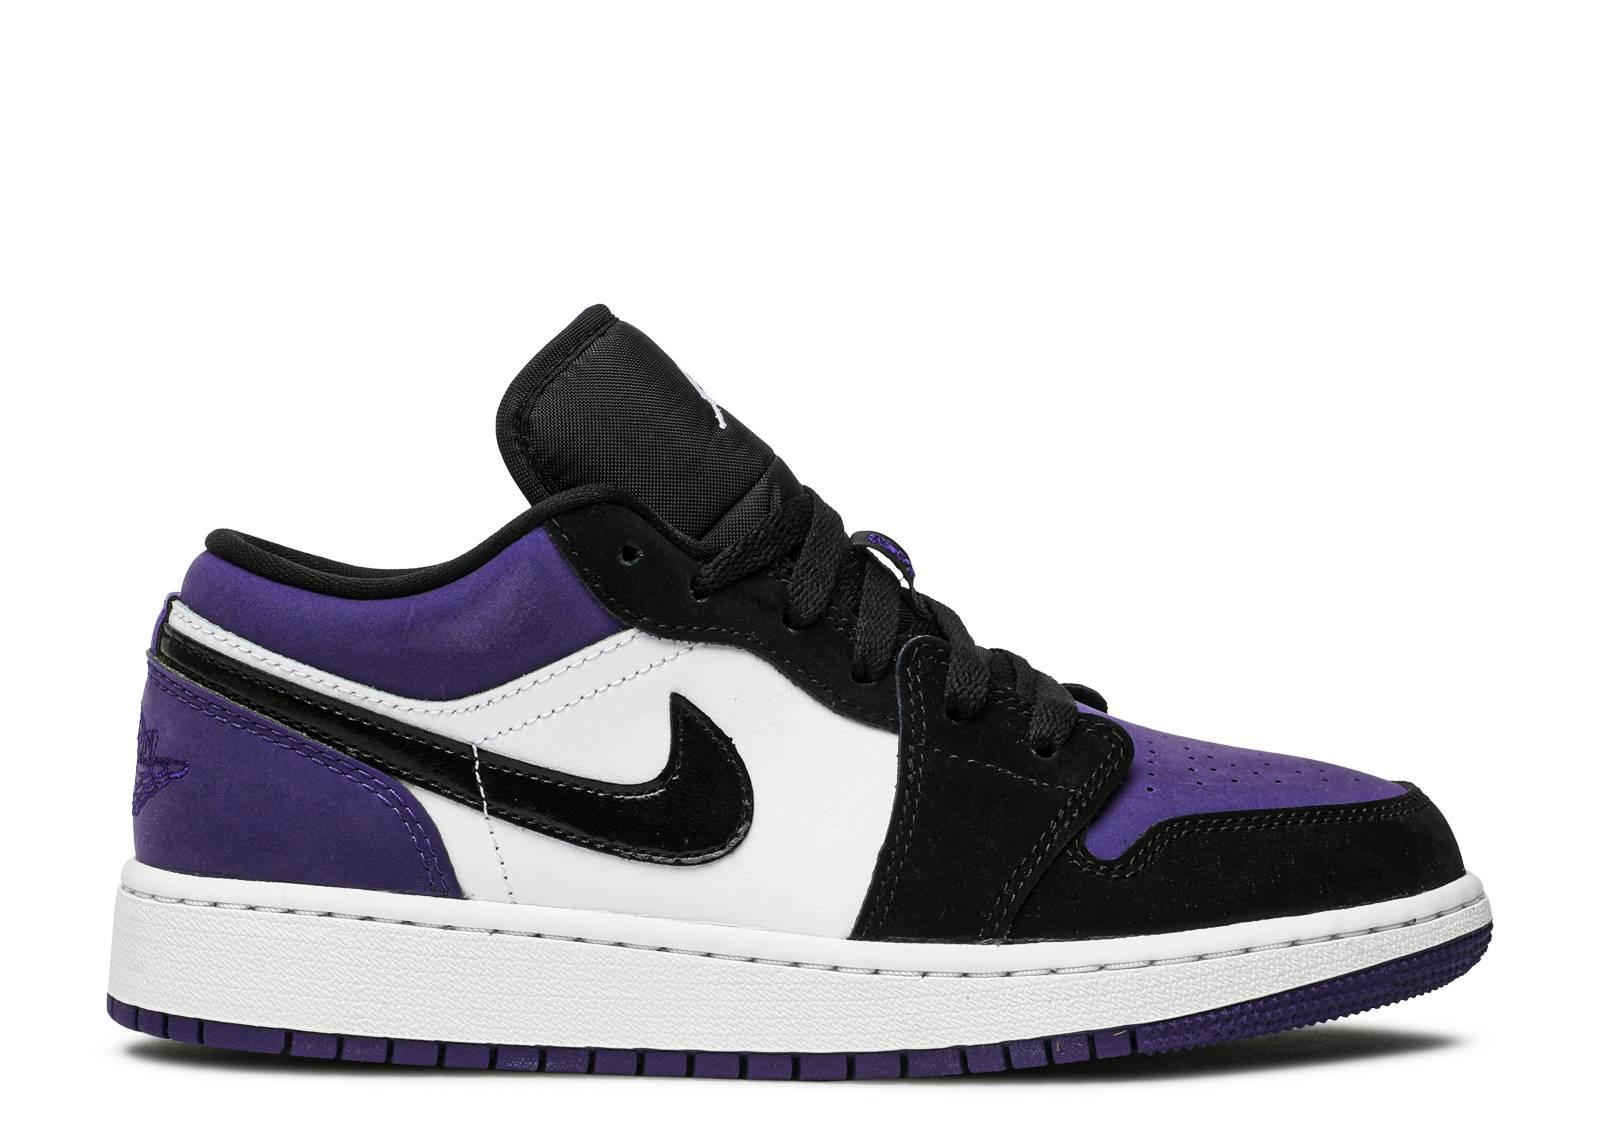 Air Jordan 1 Low GS 'Court Purple'